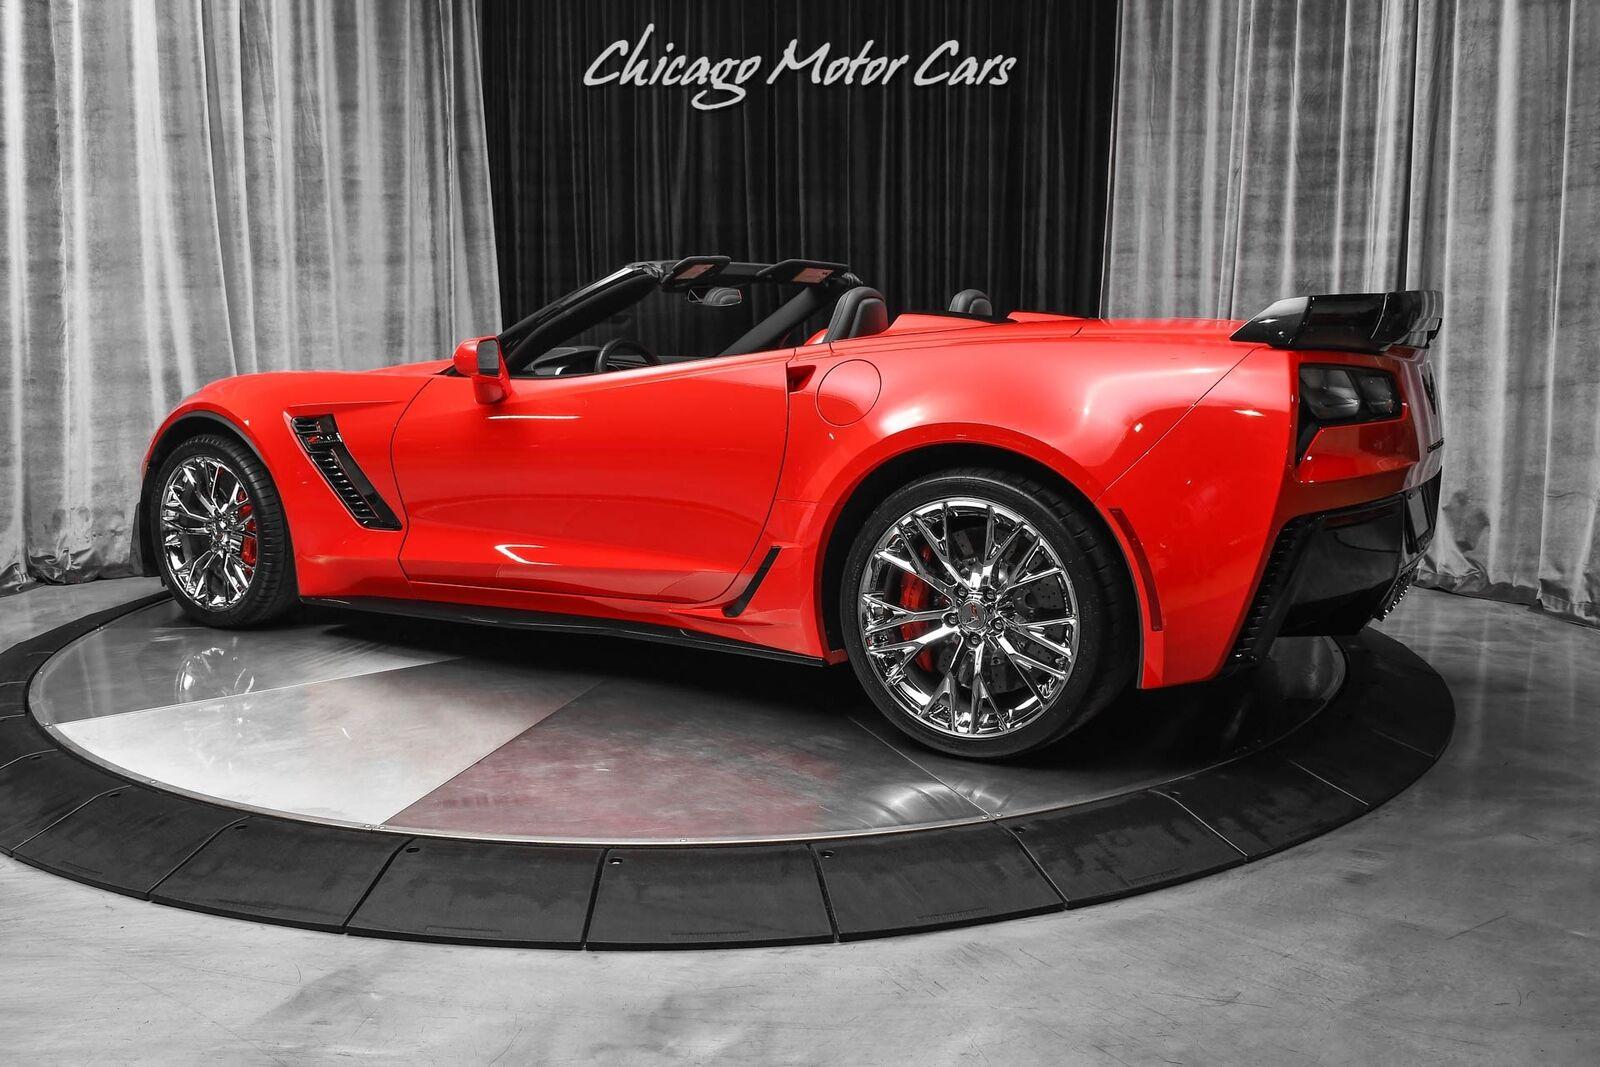 2015 Red Chevrolet Corvette Z06 2LZ | C7 Corvette Photo 3